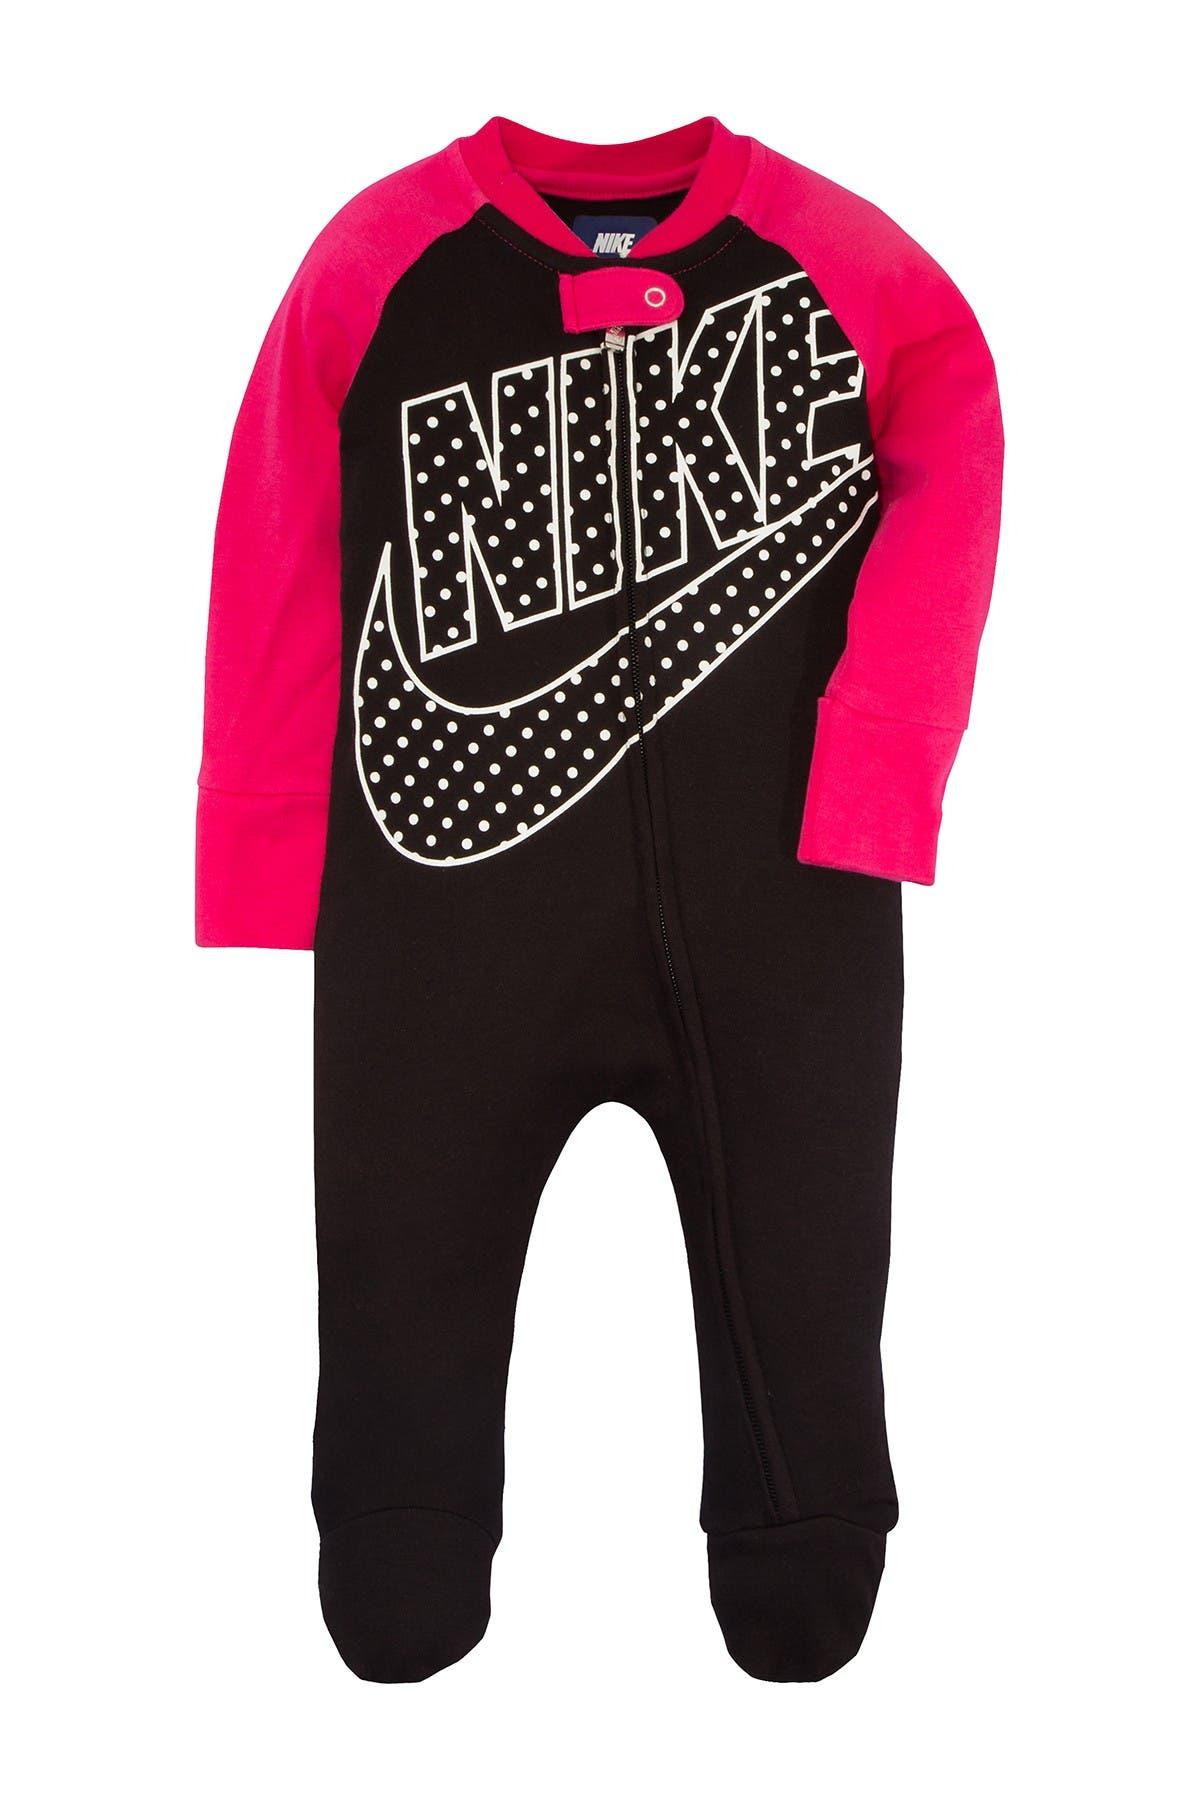 Image of Nike Futura Dot Coverall